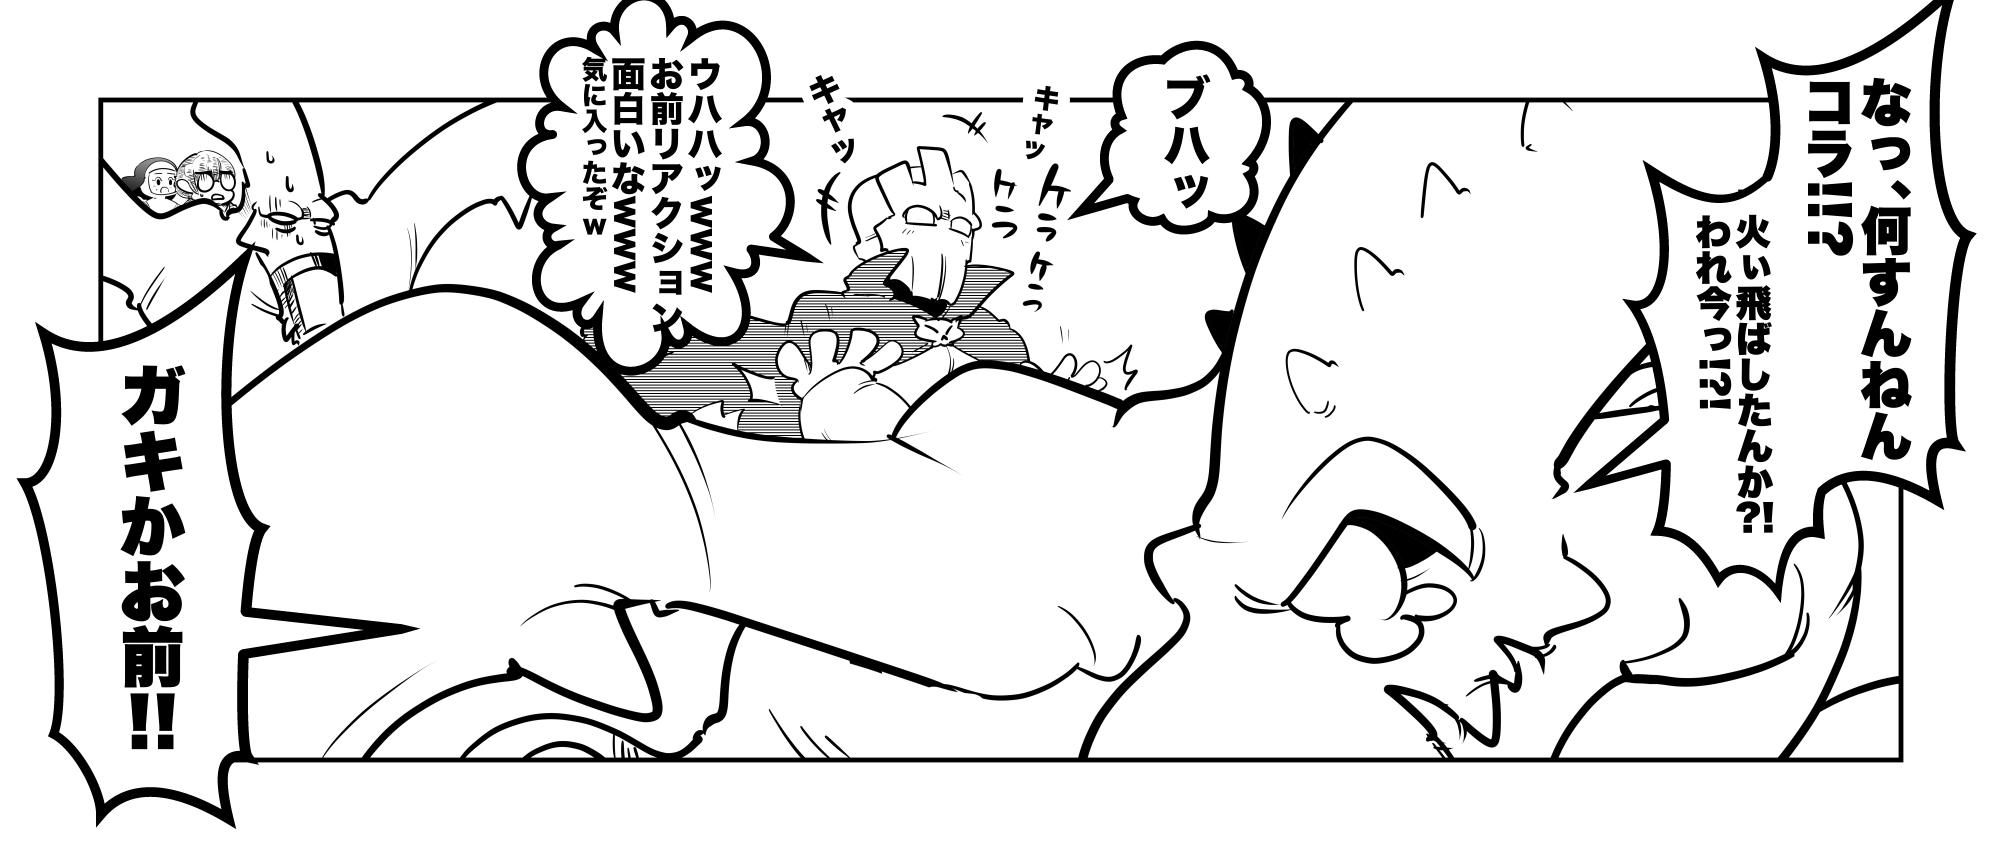 f:id:terashimaru117:20210914221210p:plain